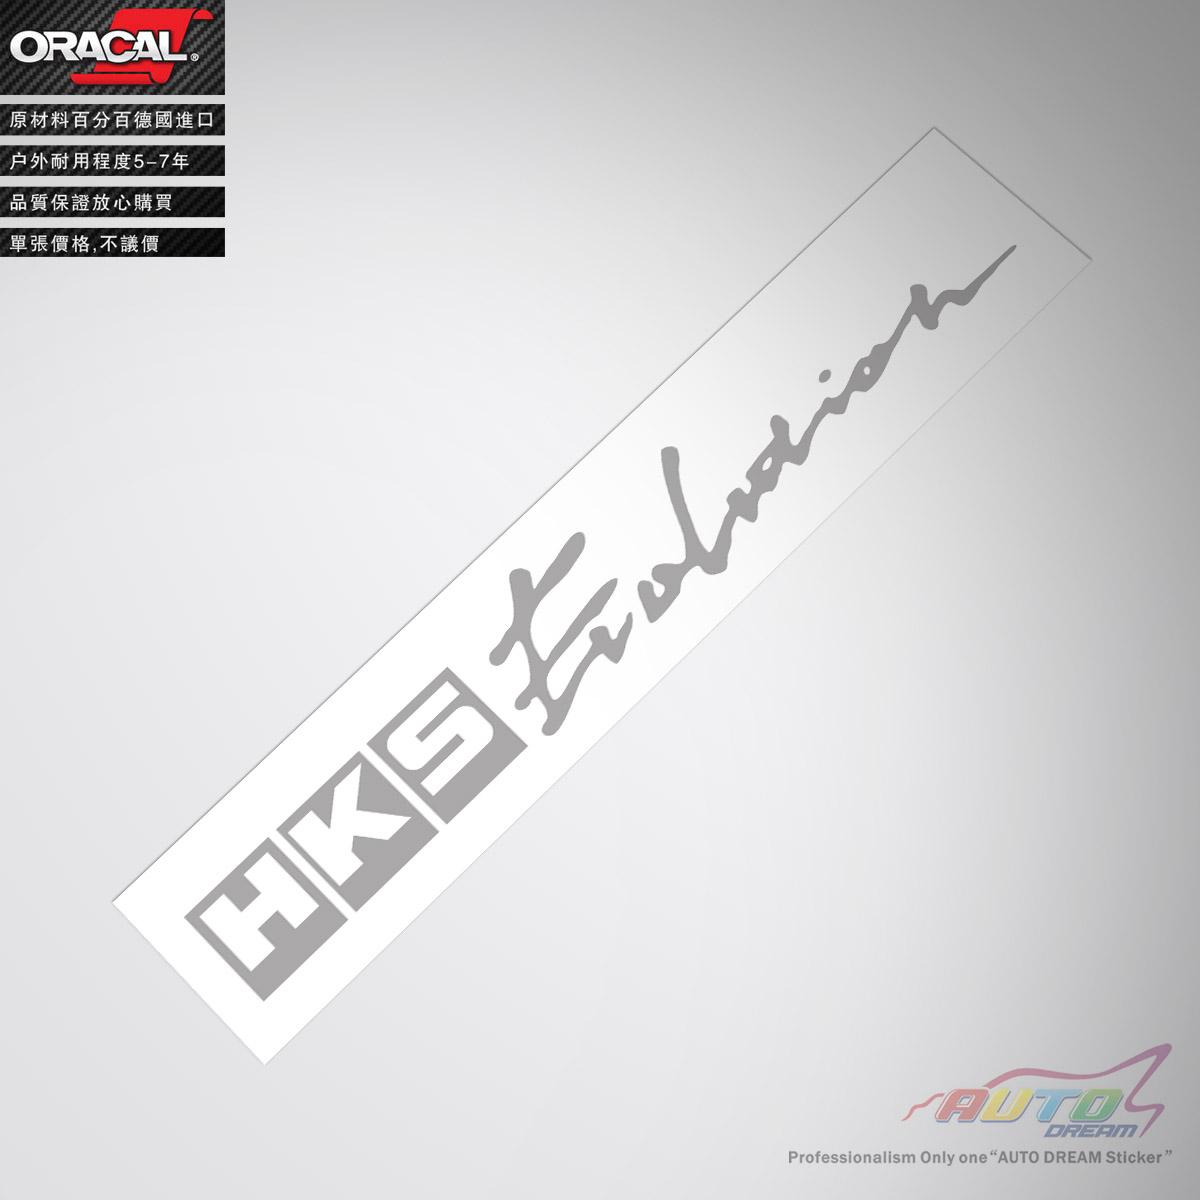 Hks Evolution Sticker Decal Hks Mitsubishi Evo Car Sticker Car Decal